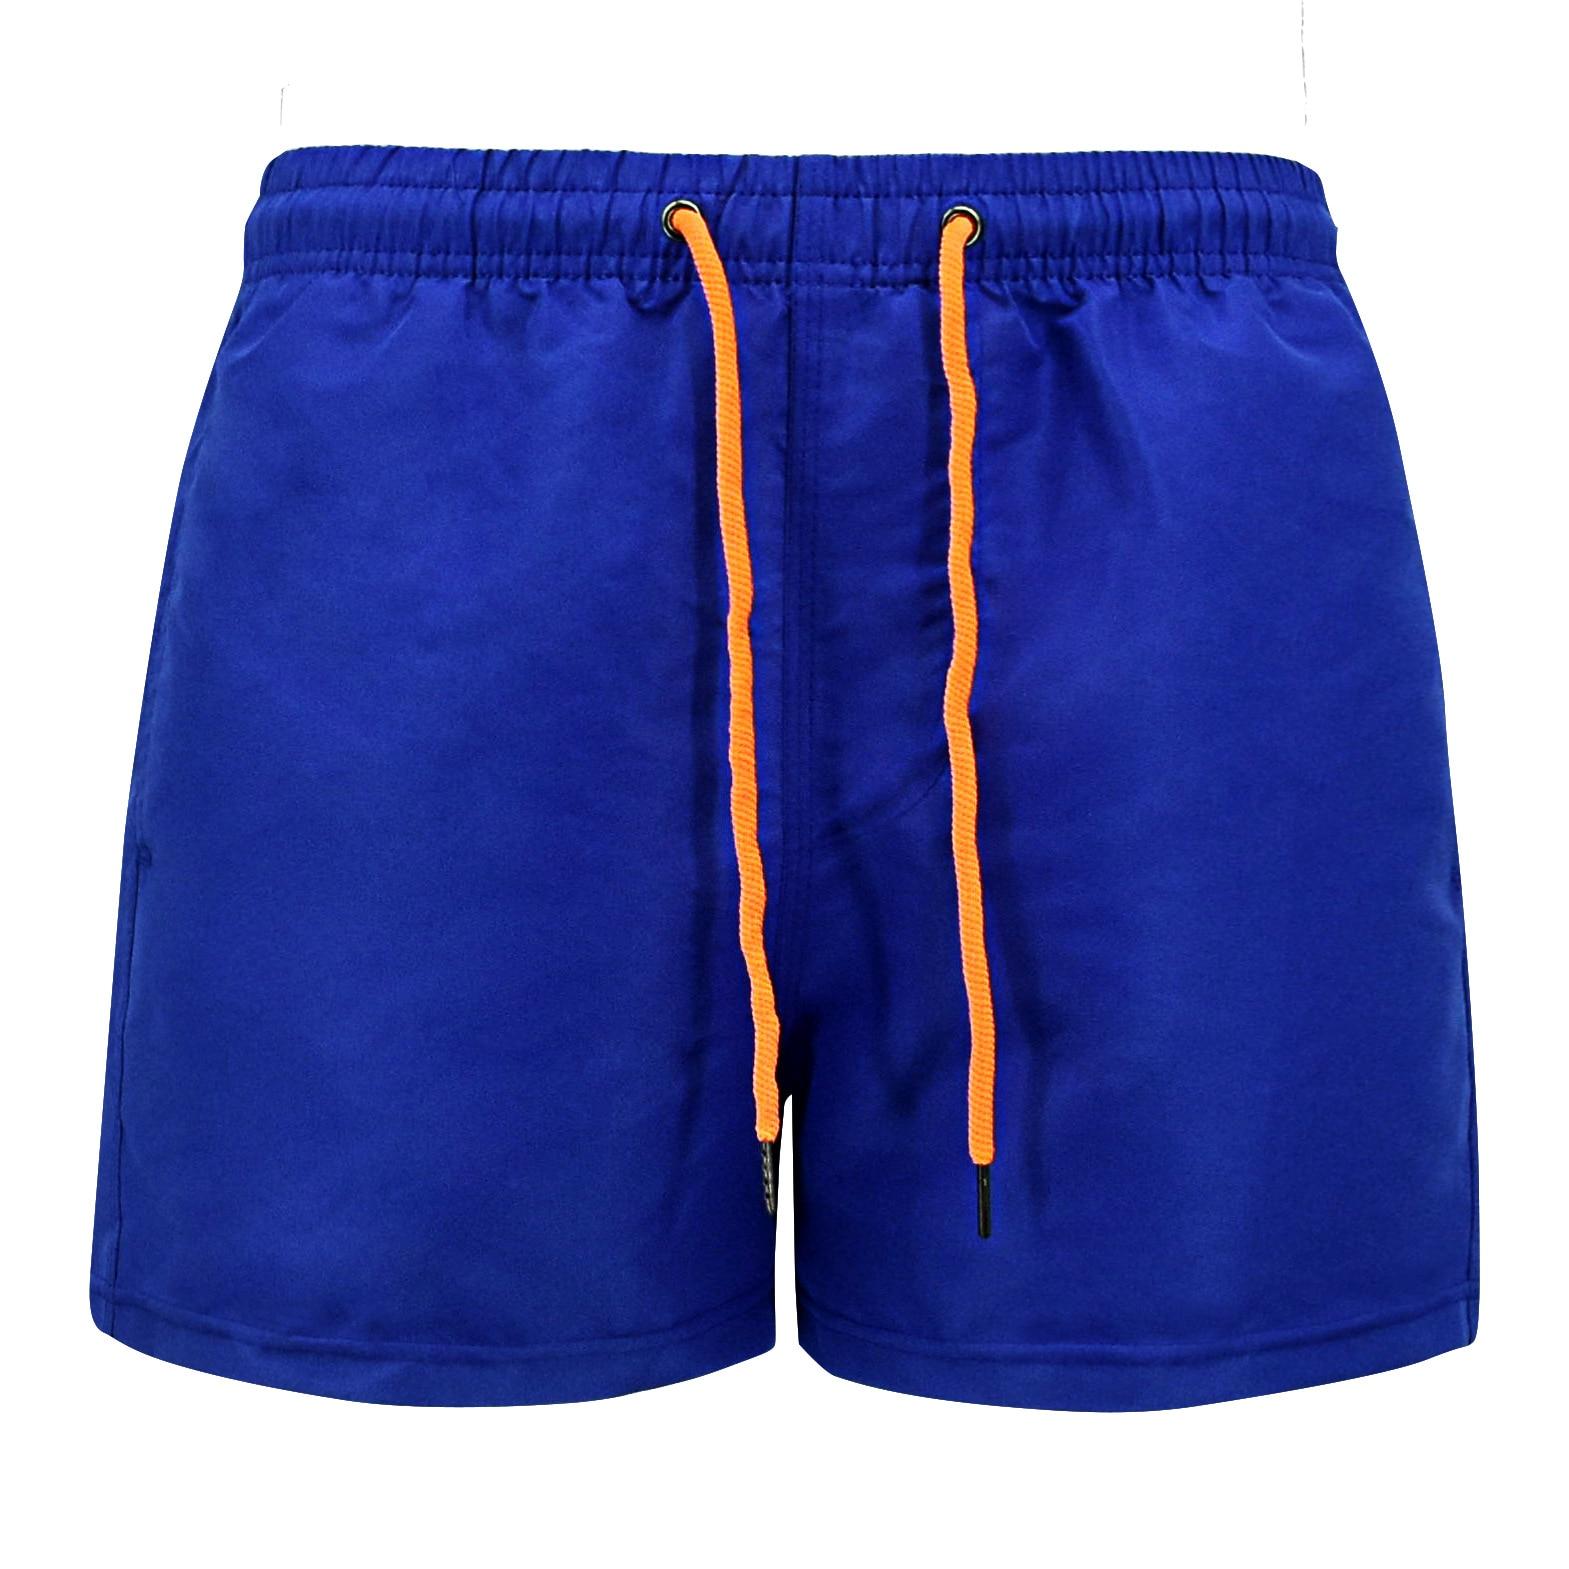 Fashion Mens Surf Board Shorts Blue Beach Shorts Men Lace Up Bike Jogger Running Sports Fitness Shorts Male Plus Size Xxxl 4xl